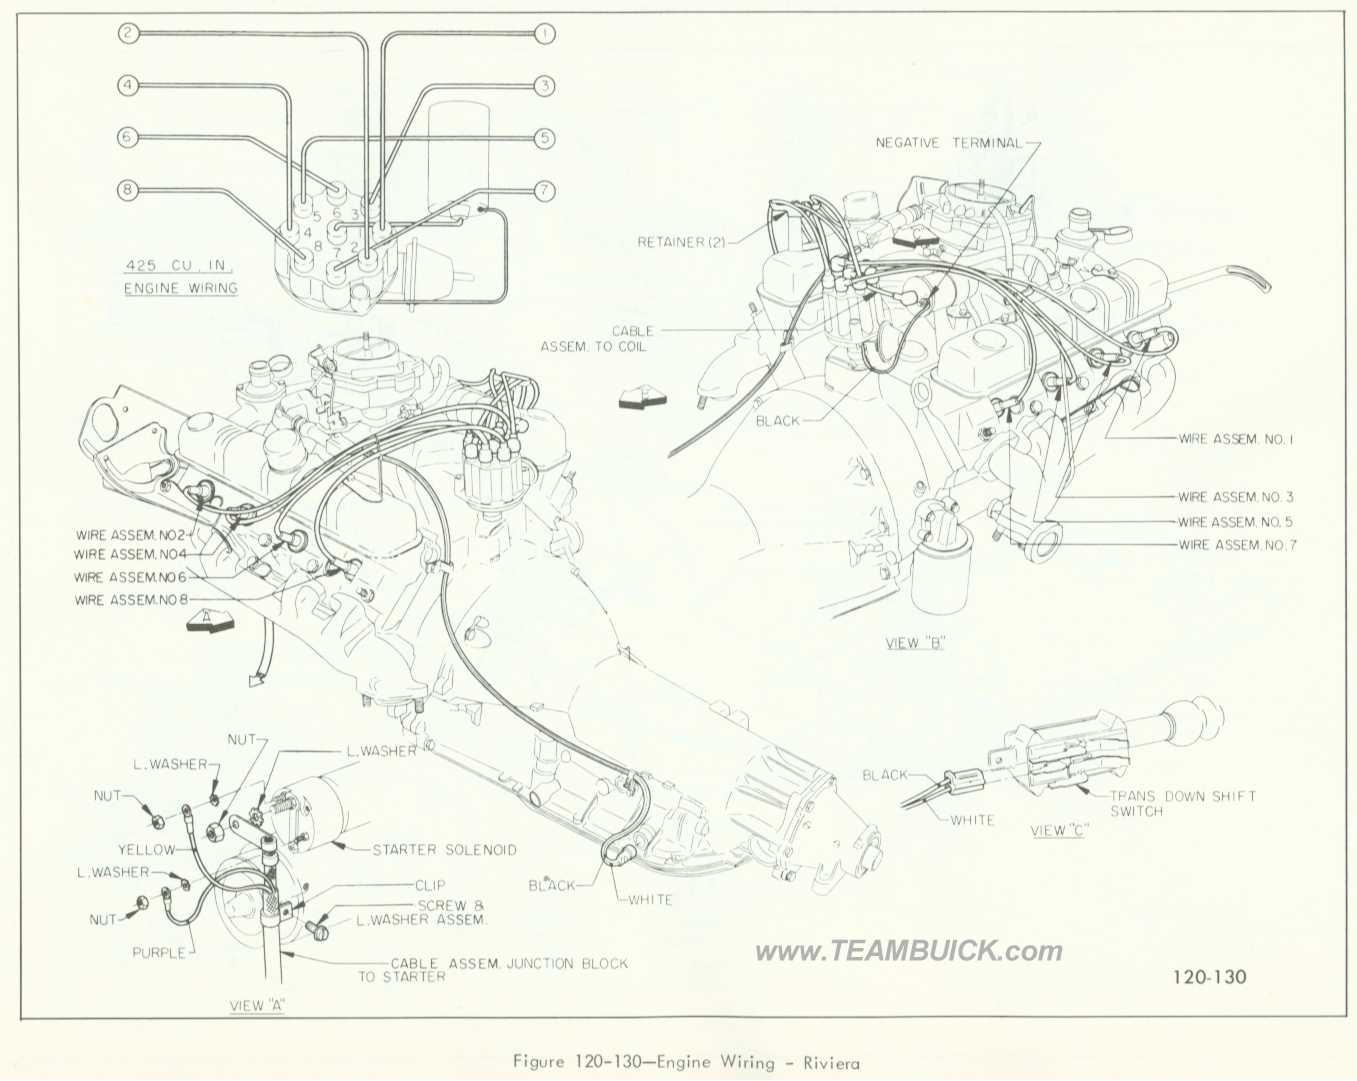 1966 Buick Riviera, Engine Wiring